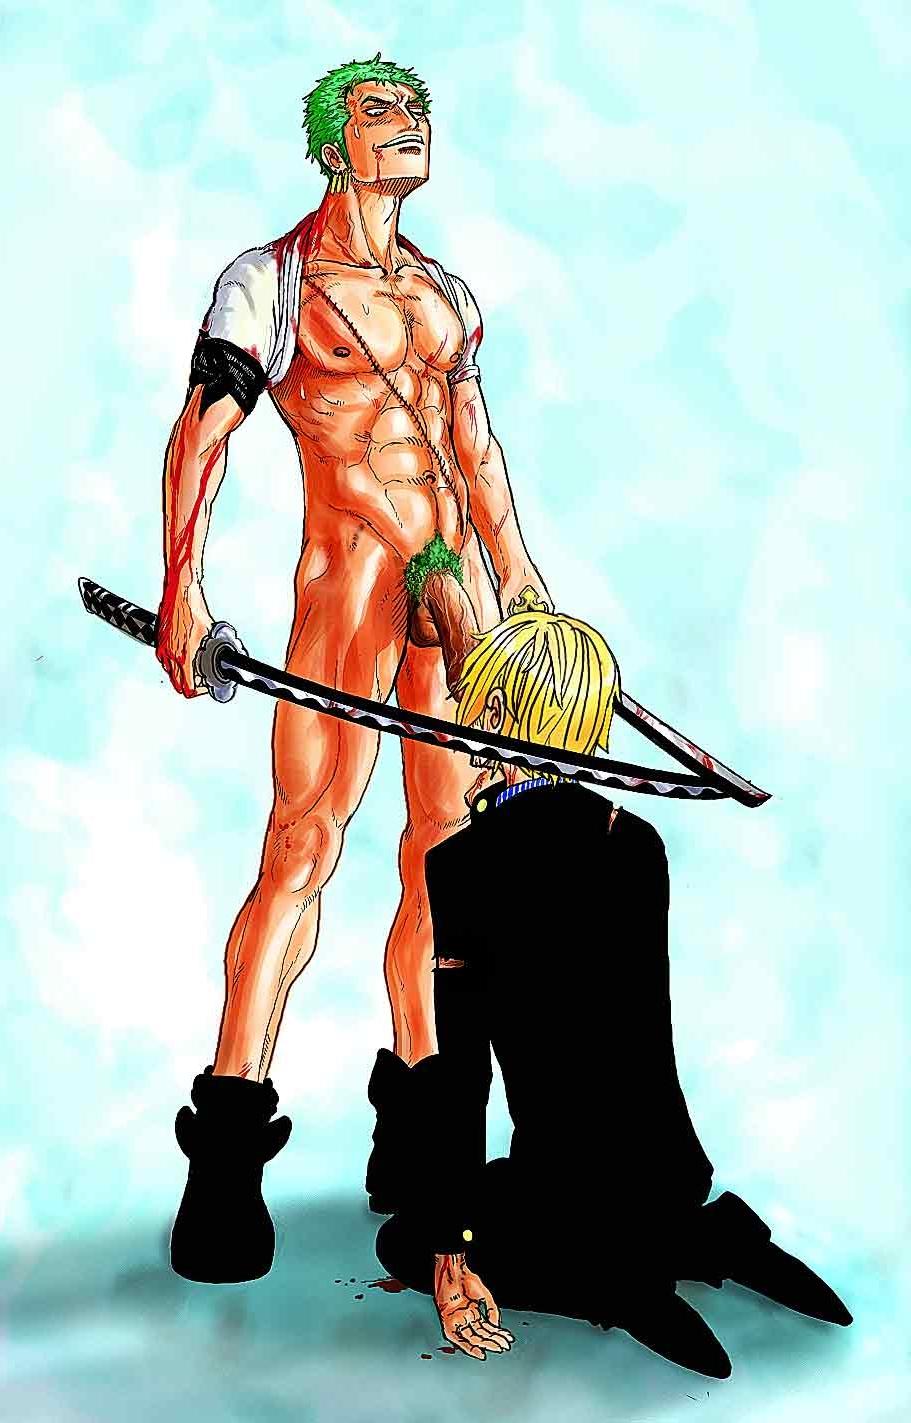 Toon sex pic ##0001301570698 2boys bara big penis blood gay muscle one piece oral pubic hair roronoa zoro ryldart sanji sword veiny penis yaoi